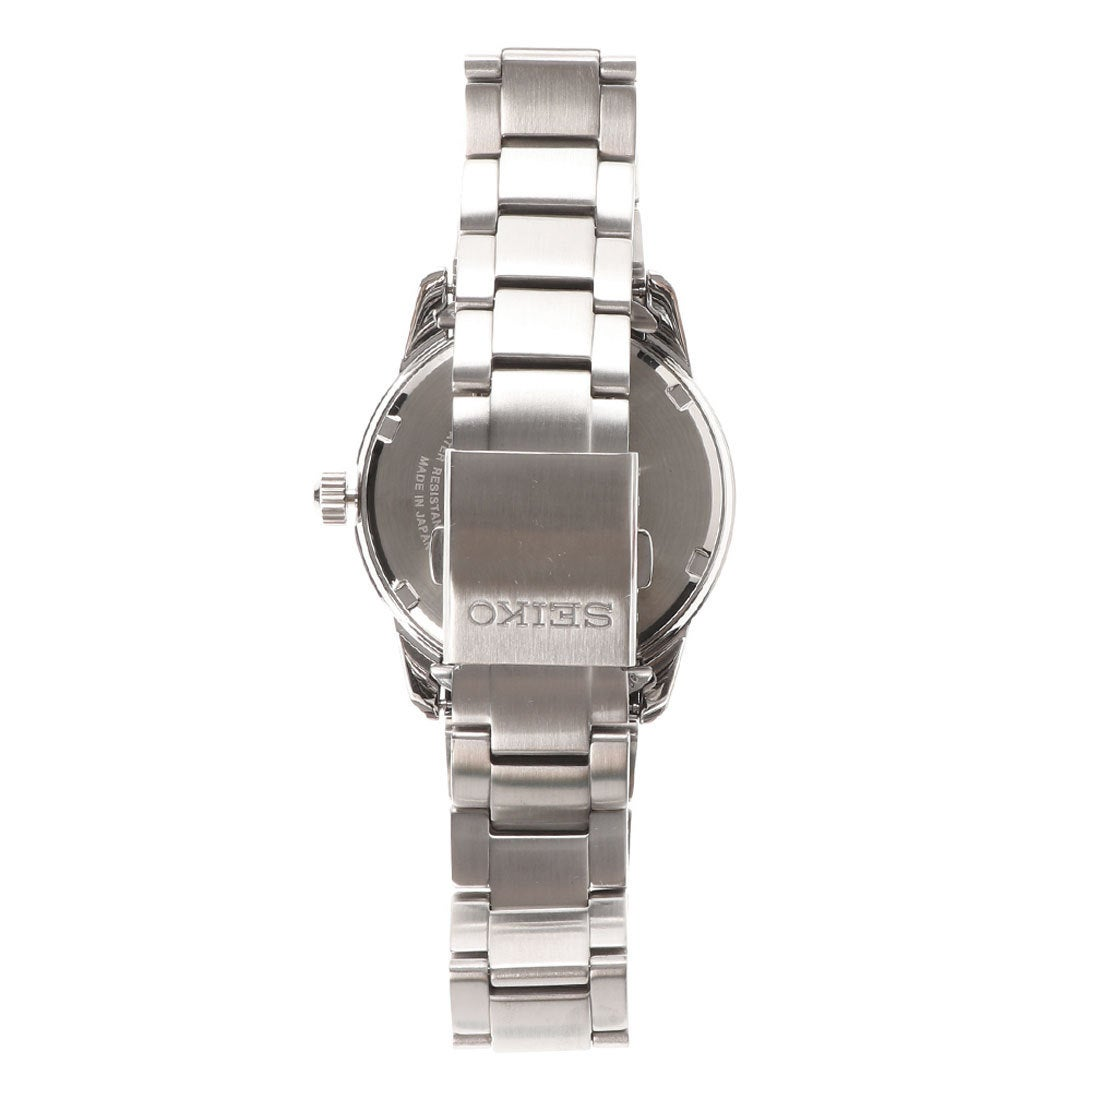 meet 930fe 6a080 SEIKO スピリット SPIRIT スマート ソーラー メンズ 腕時計 ...